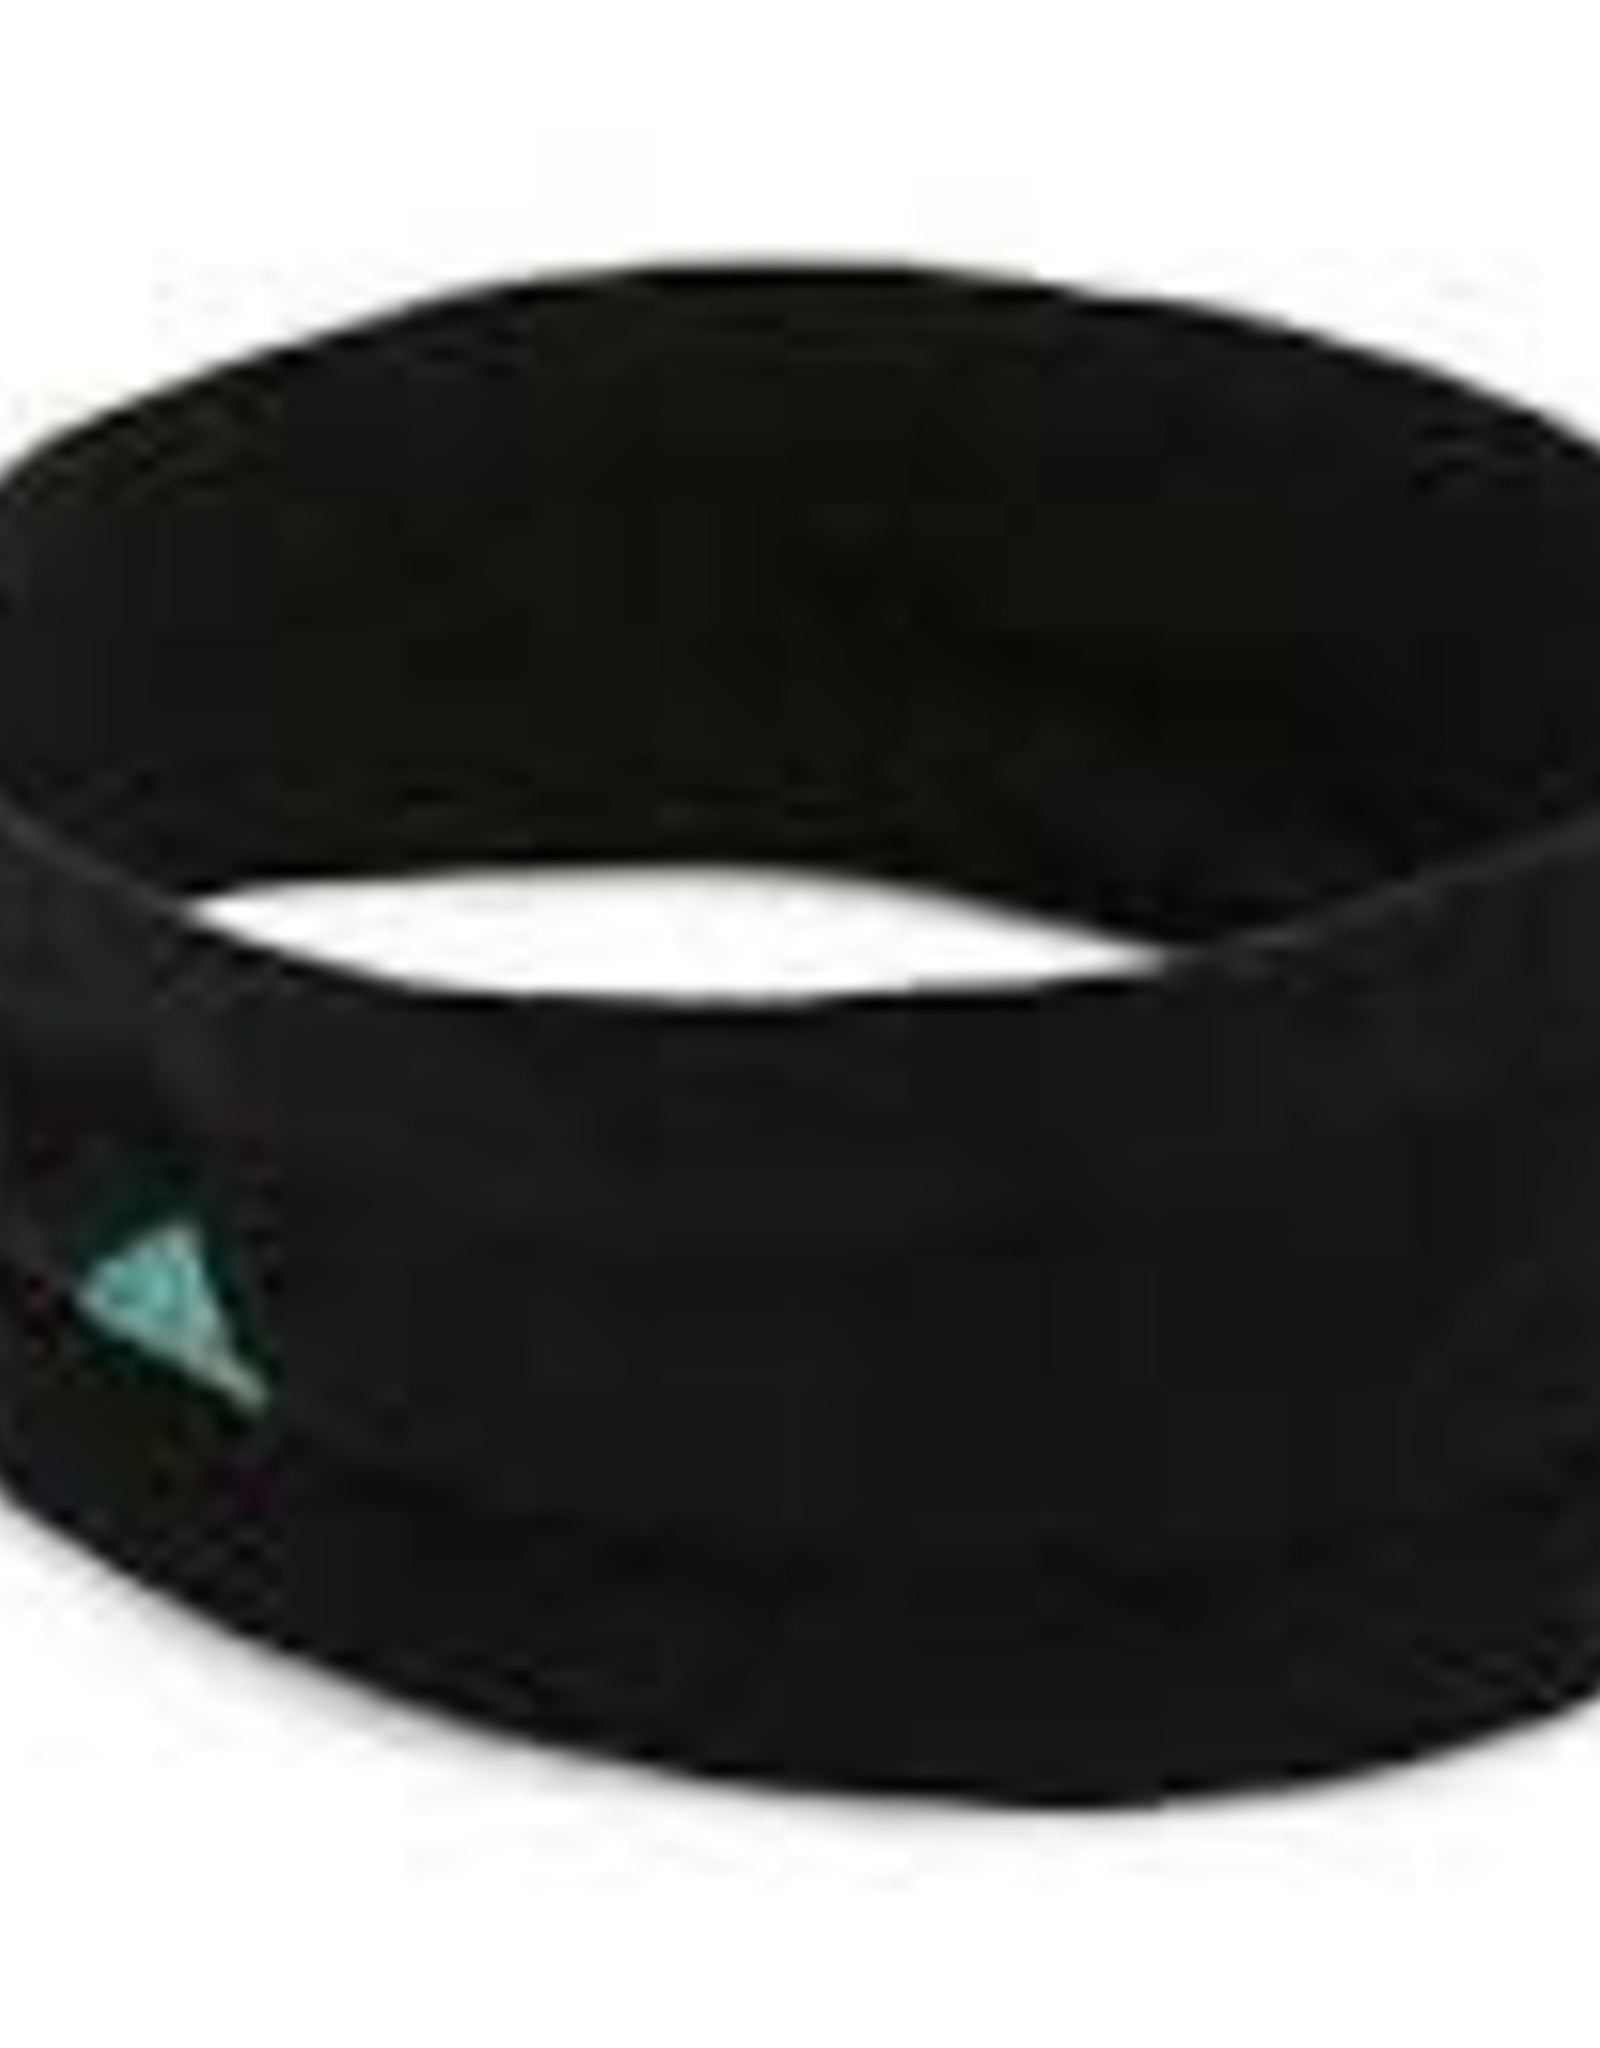 Adidas Adidas Women's Hairband - Black/Mint